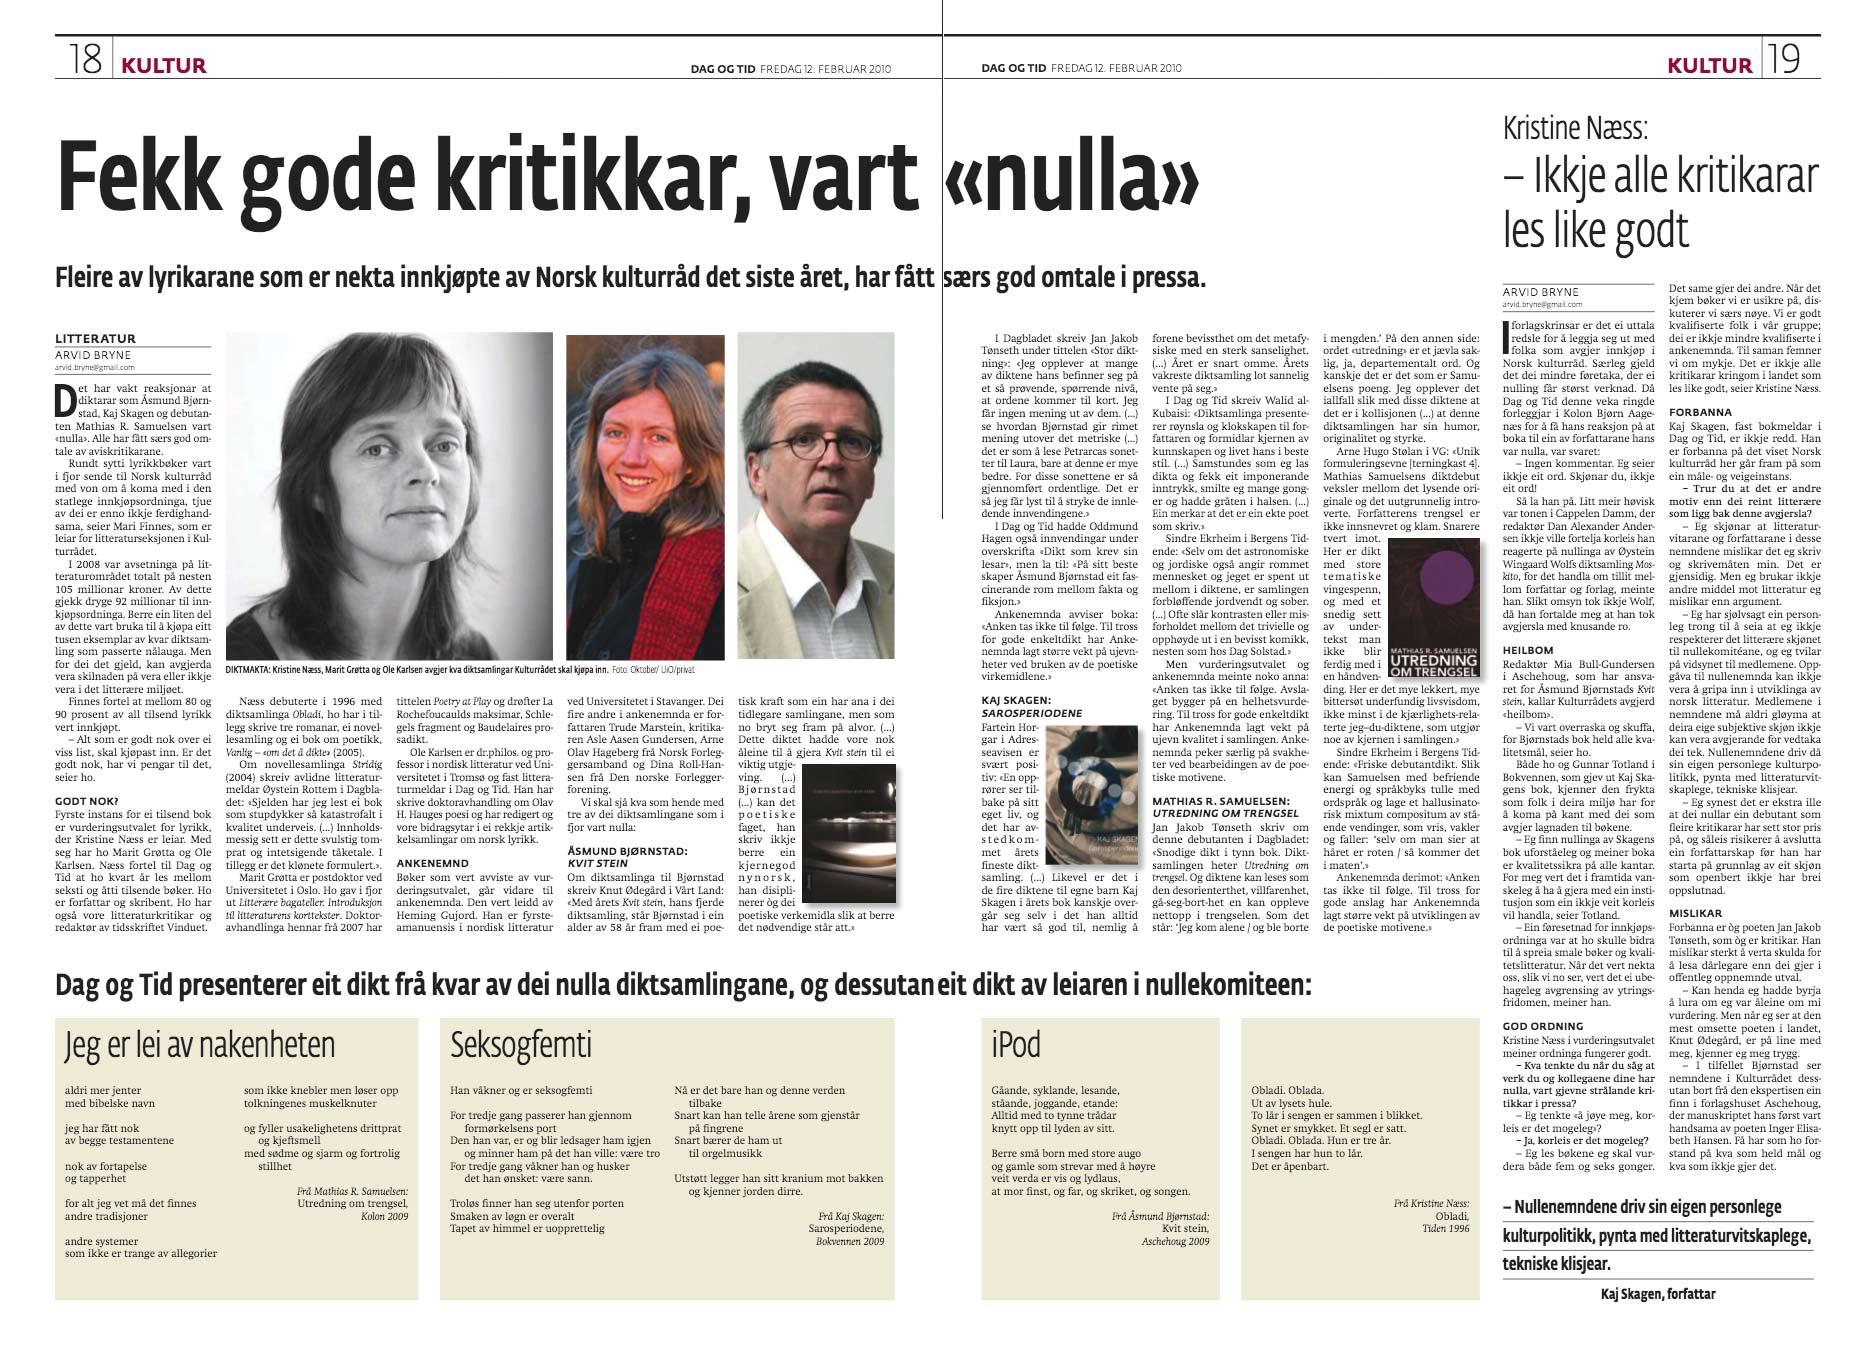 Faksimile fra Dag og Tid februar 2010